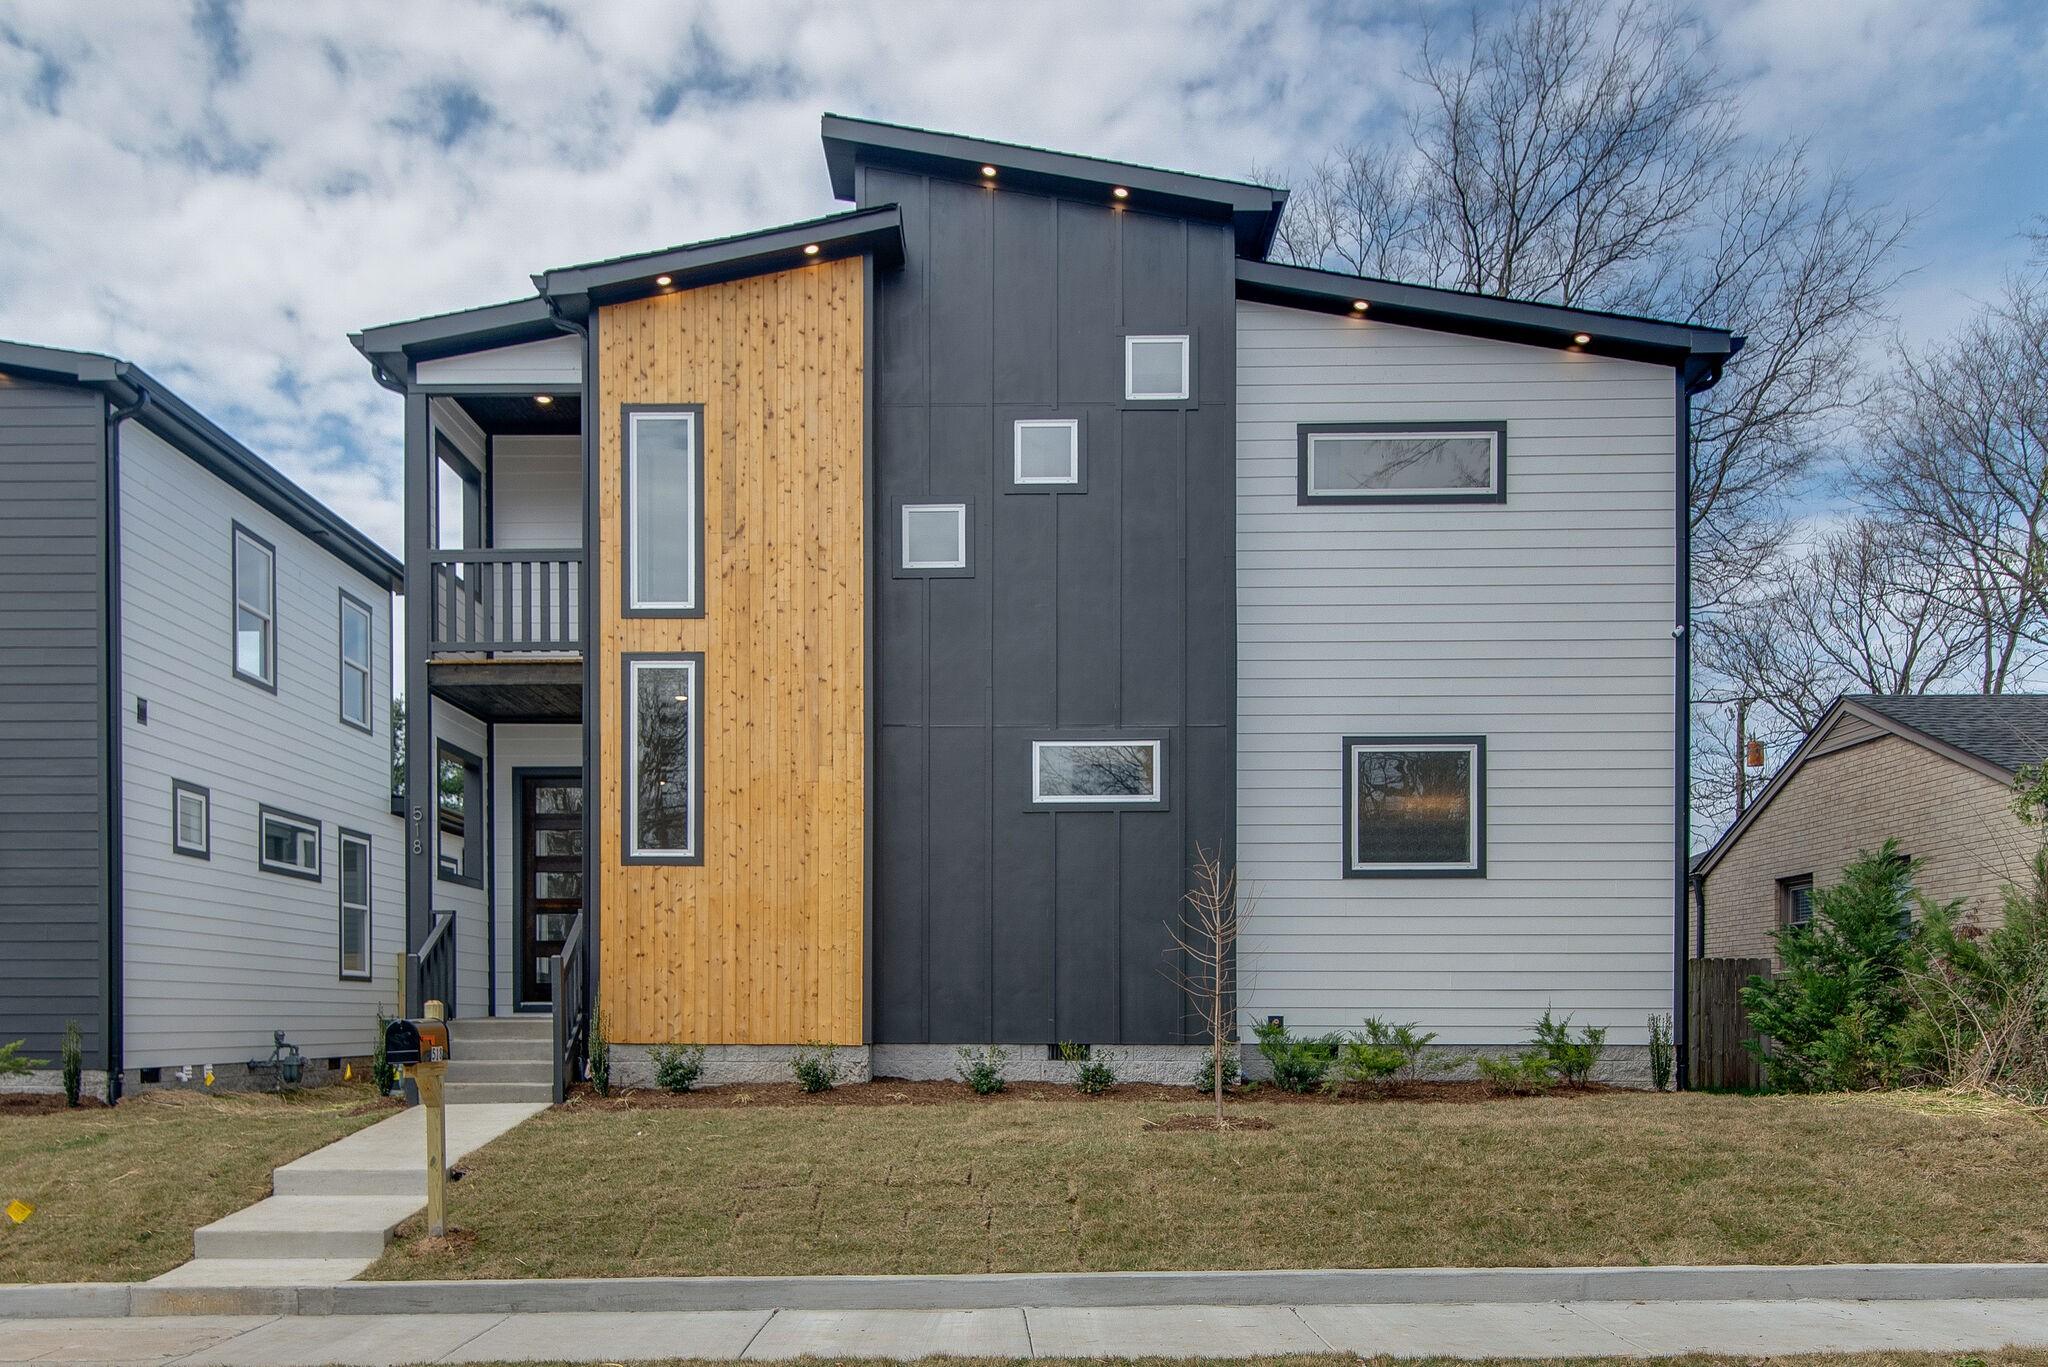 518 N 2nd St Property Photo - Nashville, TN real estate listing